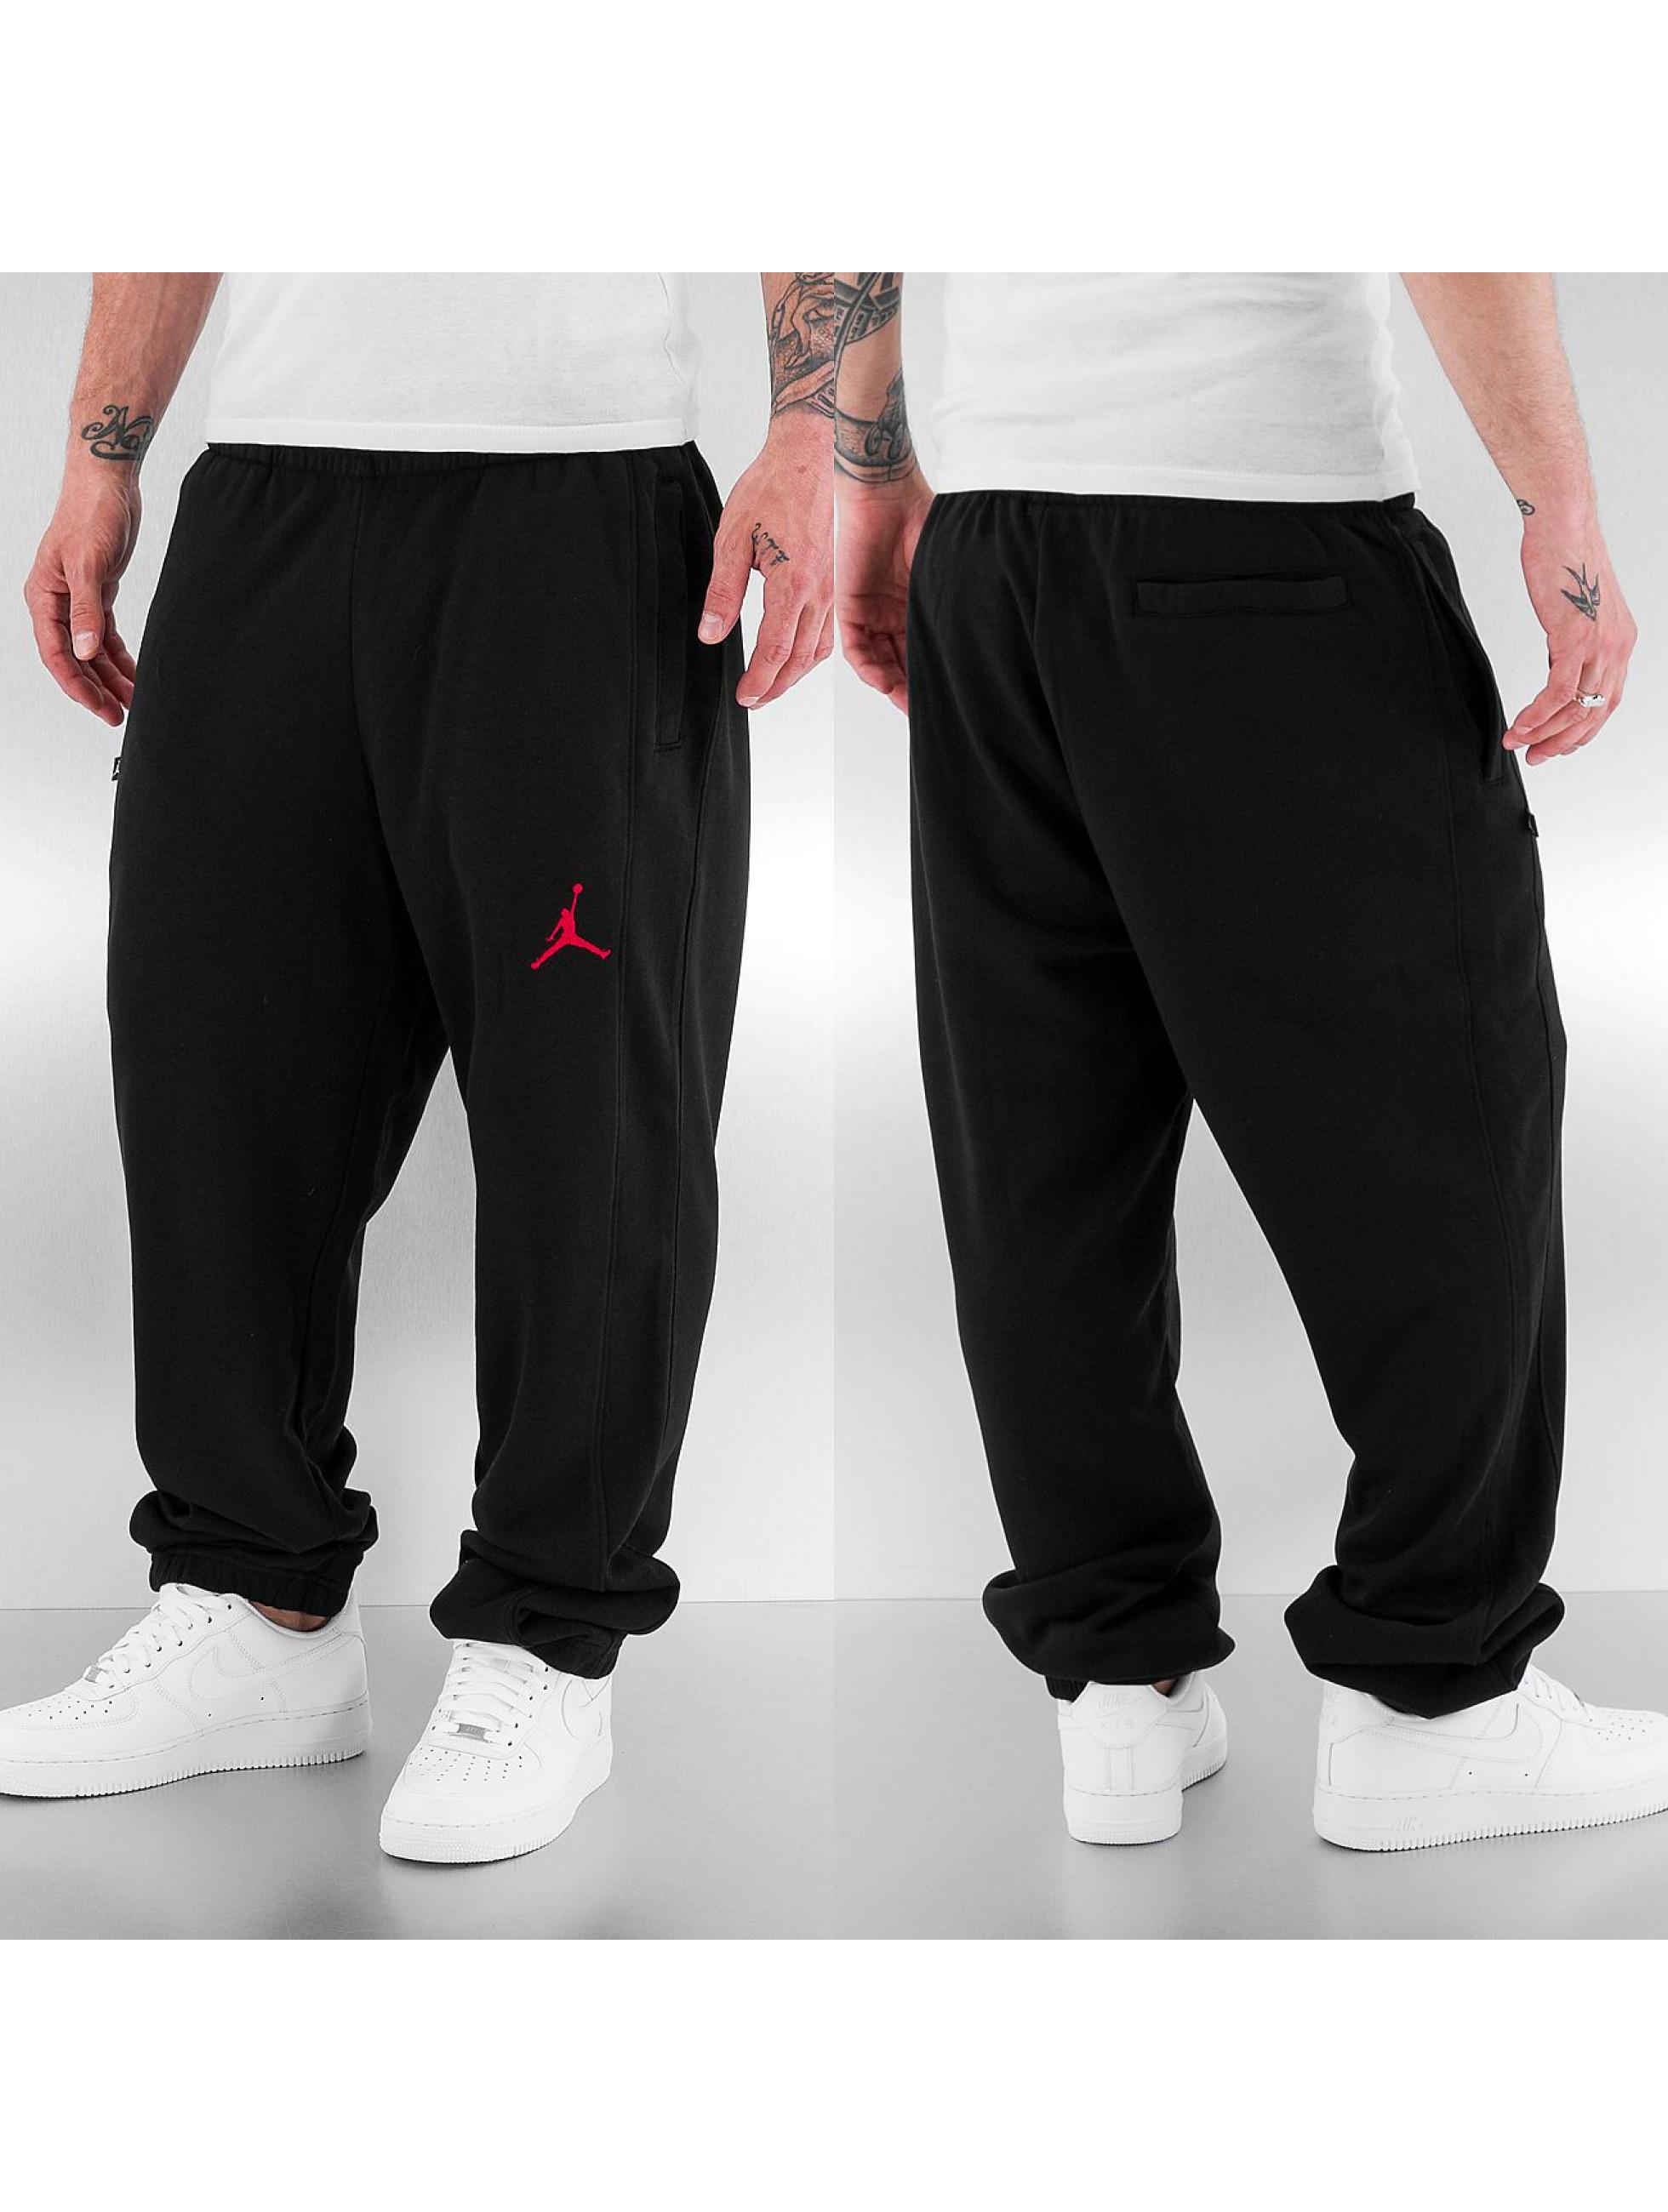 Gimnasio Baños Jordan:Jordan Pantalón / Pantalón deportivo All Around en negro